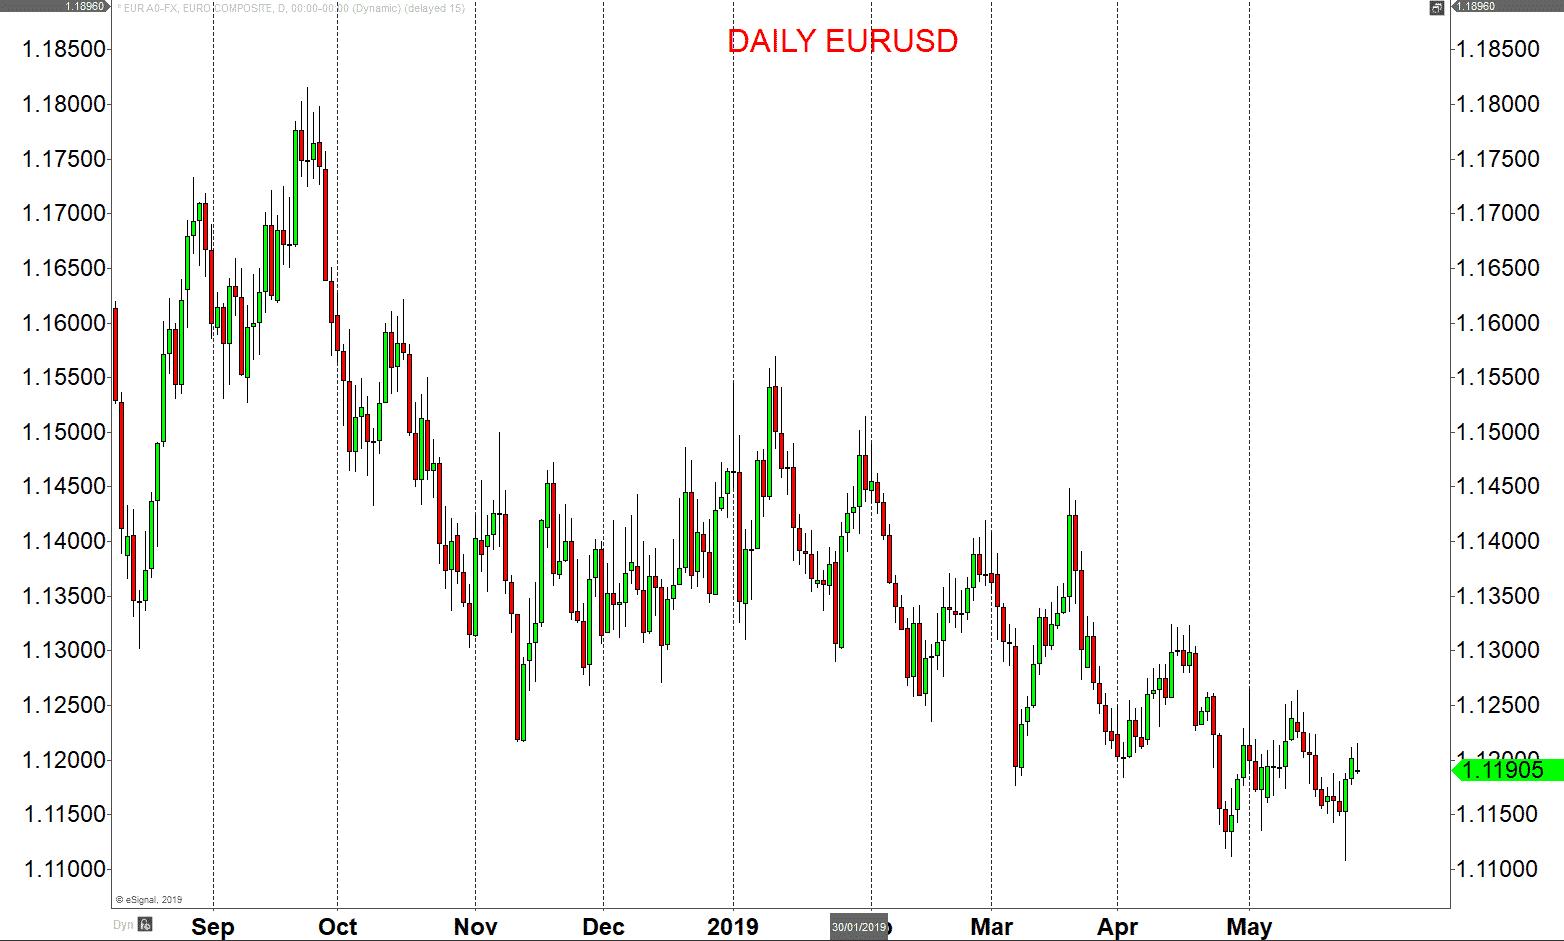 Daily EURUSD